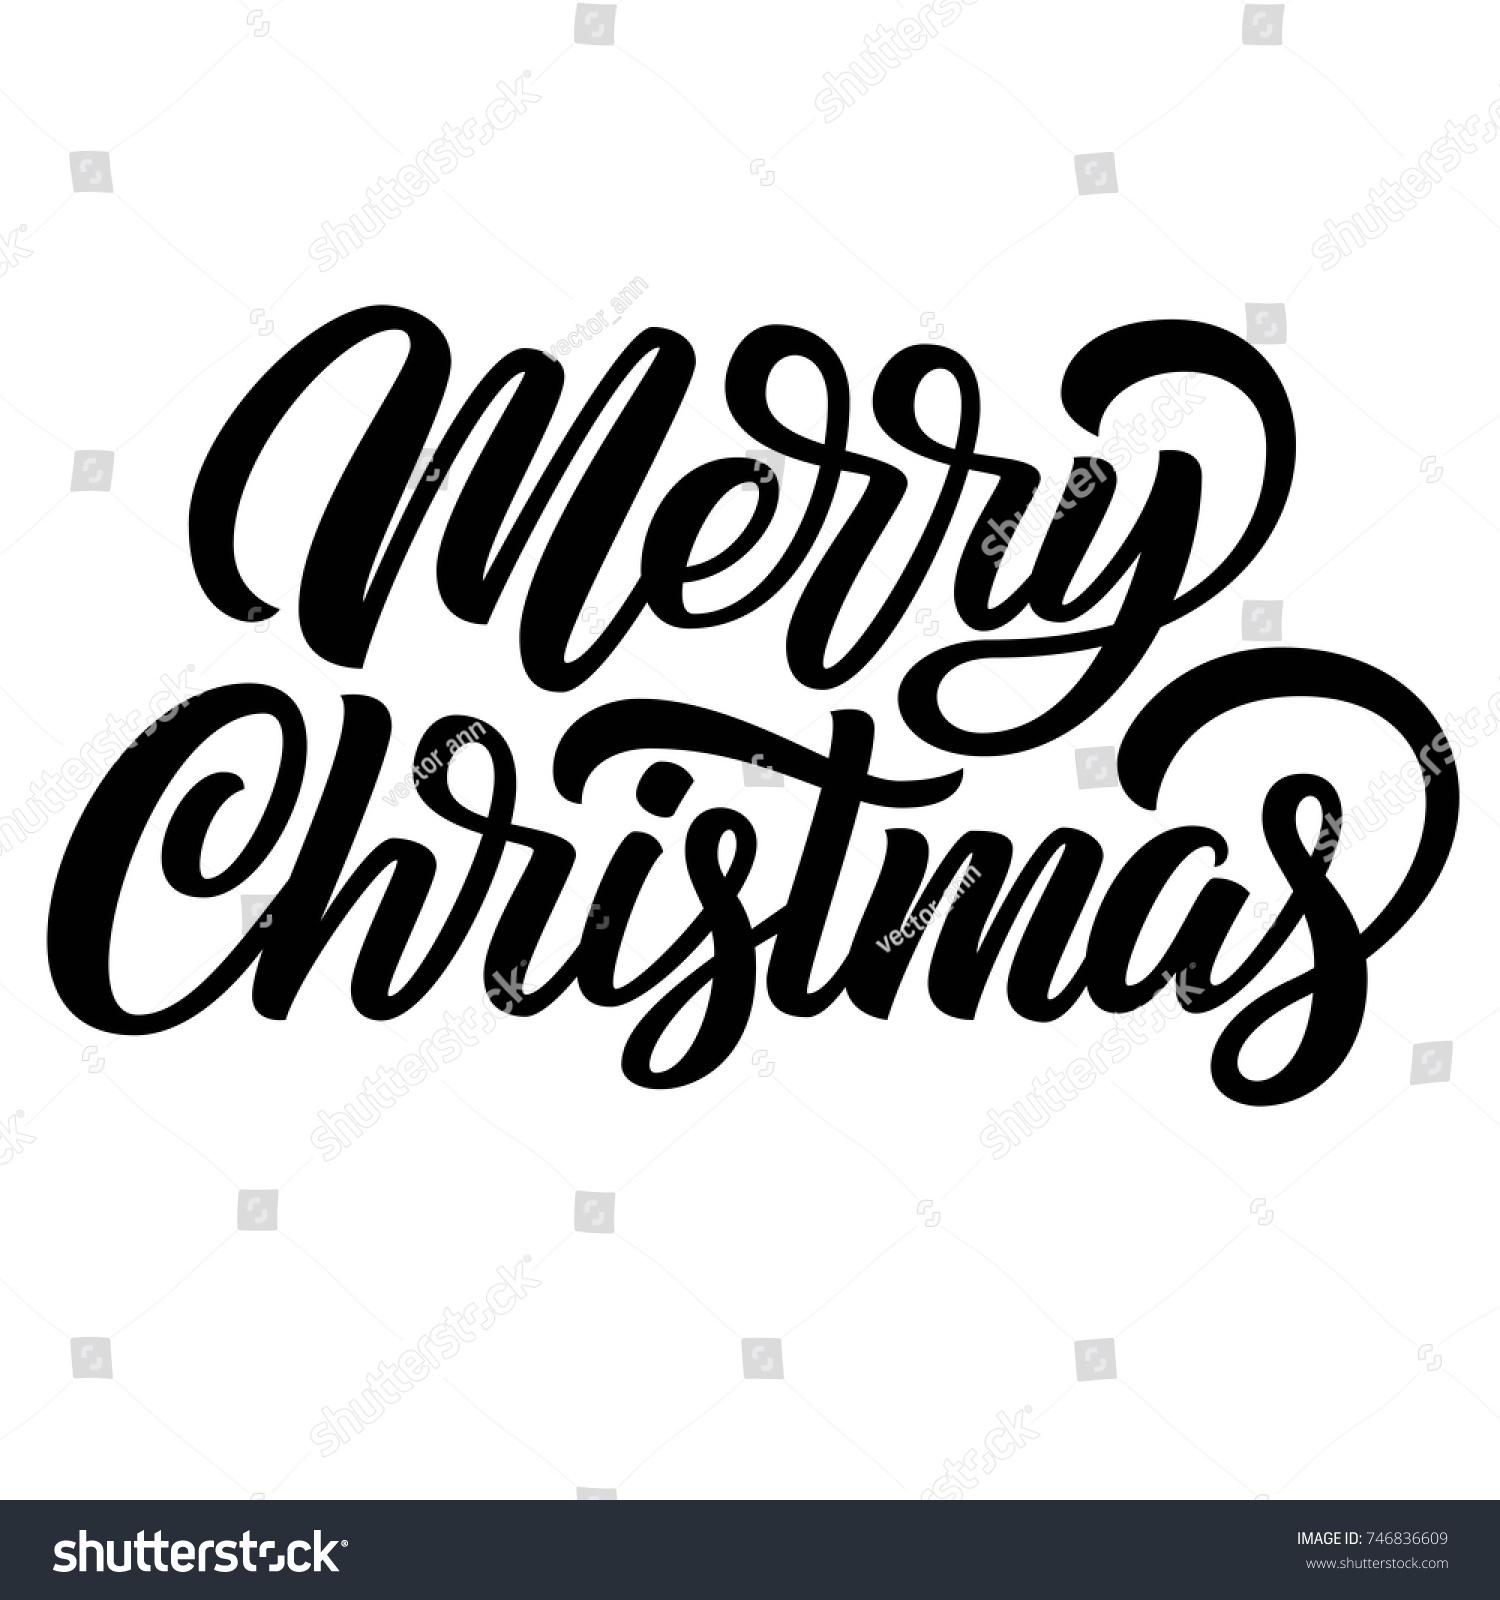 Merry Christmas black ink brush hand lettering isolated on white ...